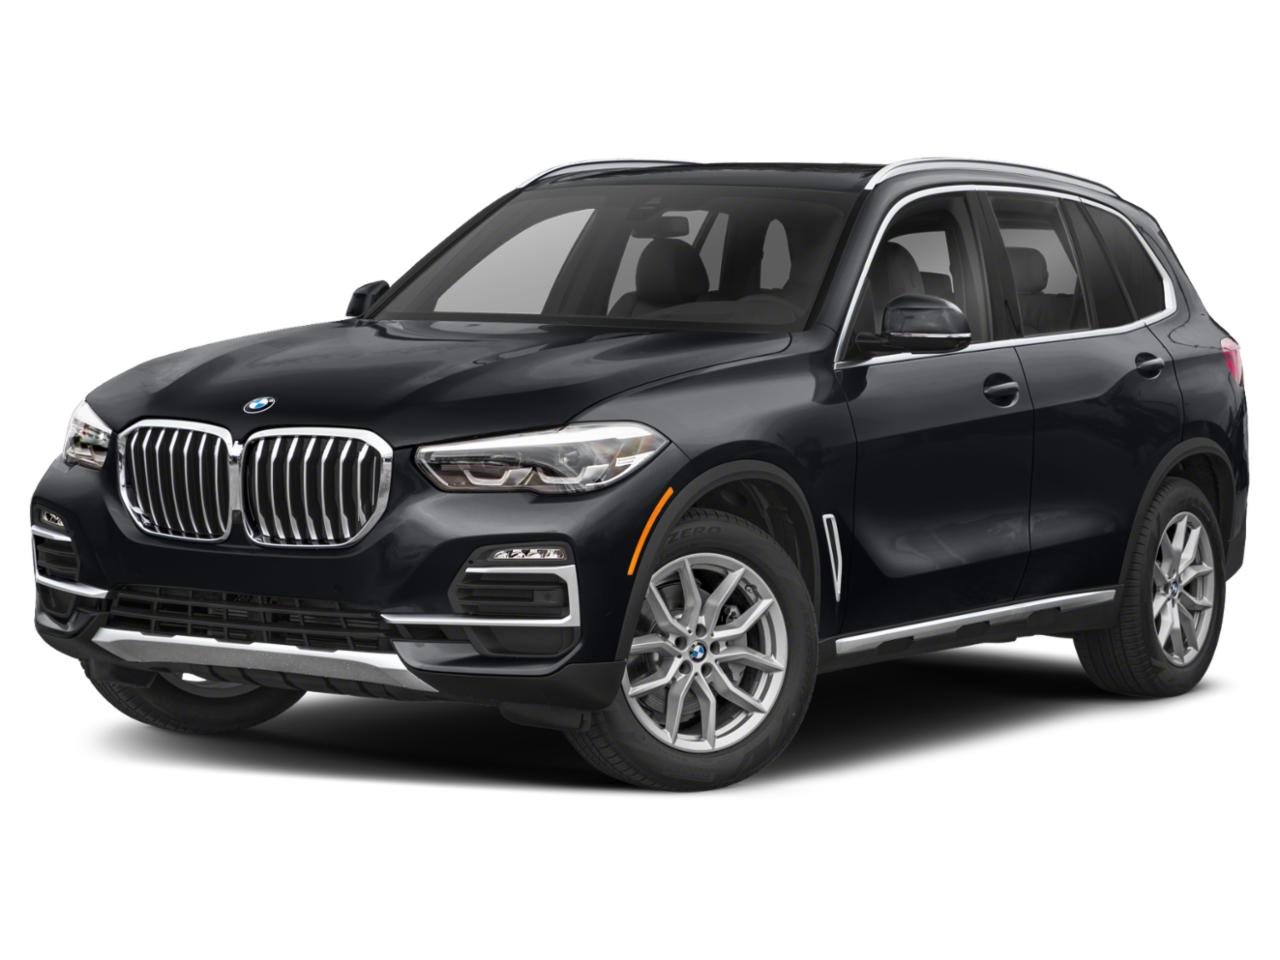 2021 BMW X5 Vehicle Photo in Appleton, WI 54913